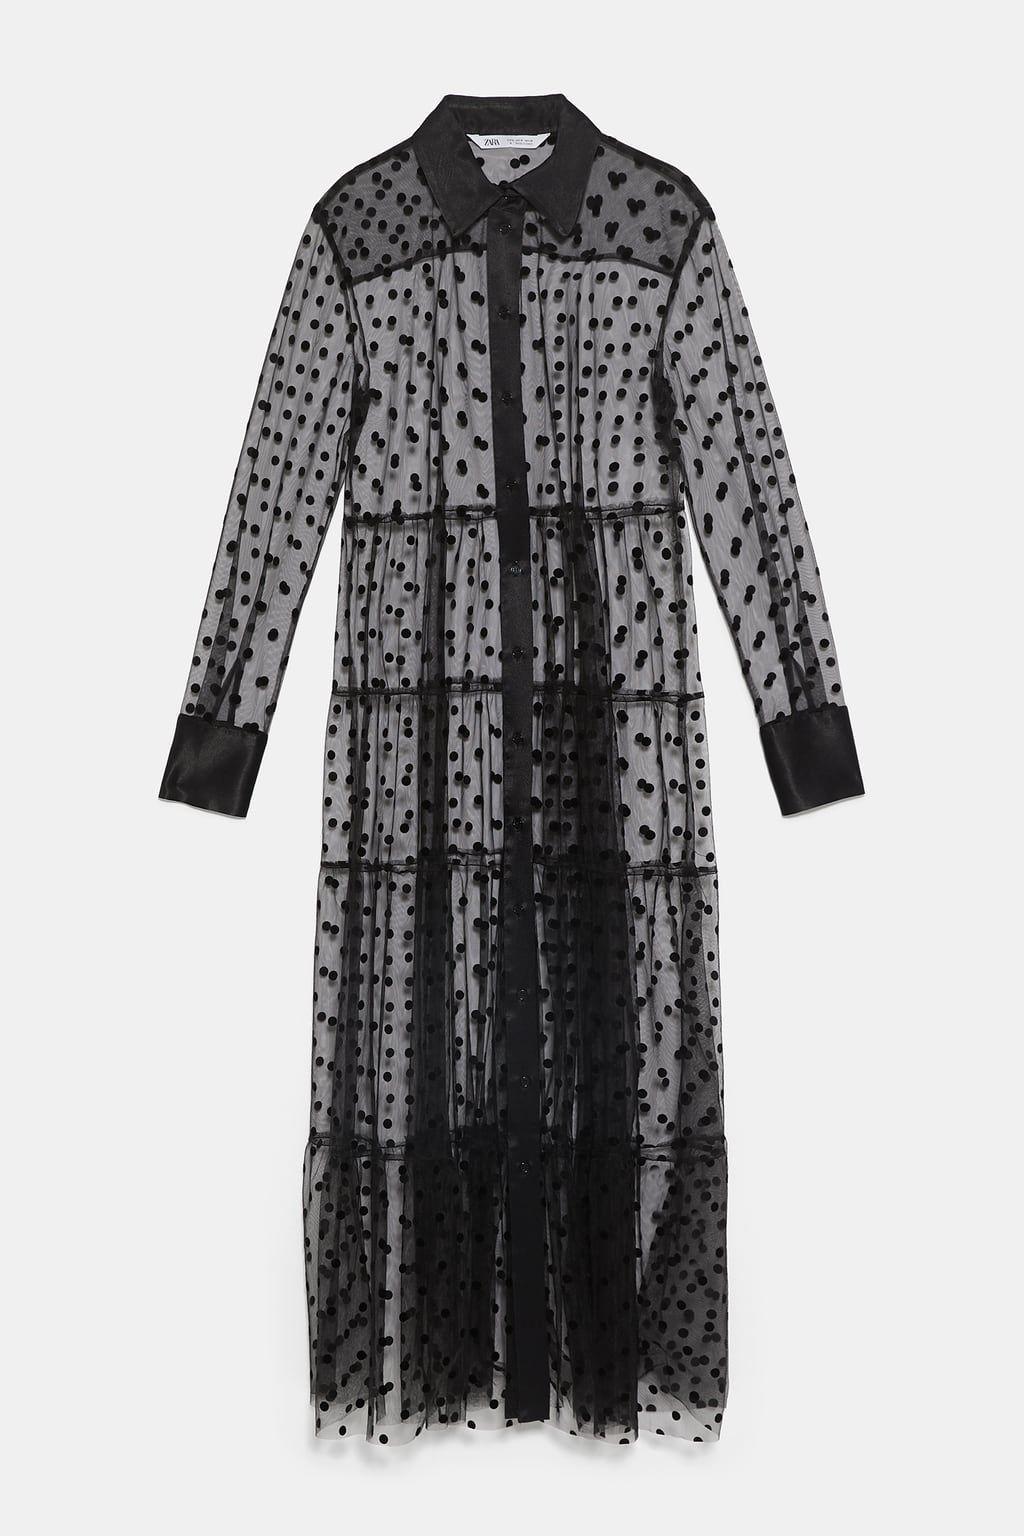 39 99 Image 9 Of Polka Dot Tulle Dress From Zara Gaya Model Pakaian Gaya Berpakaian Model Baju Wanita